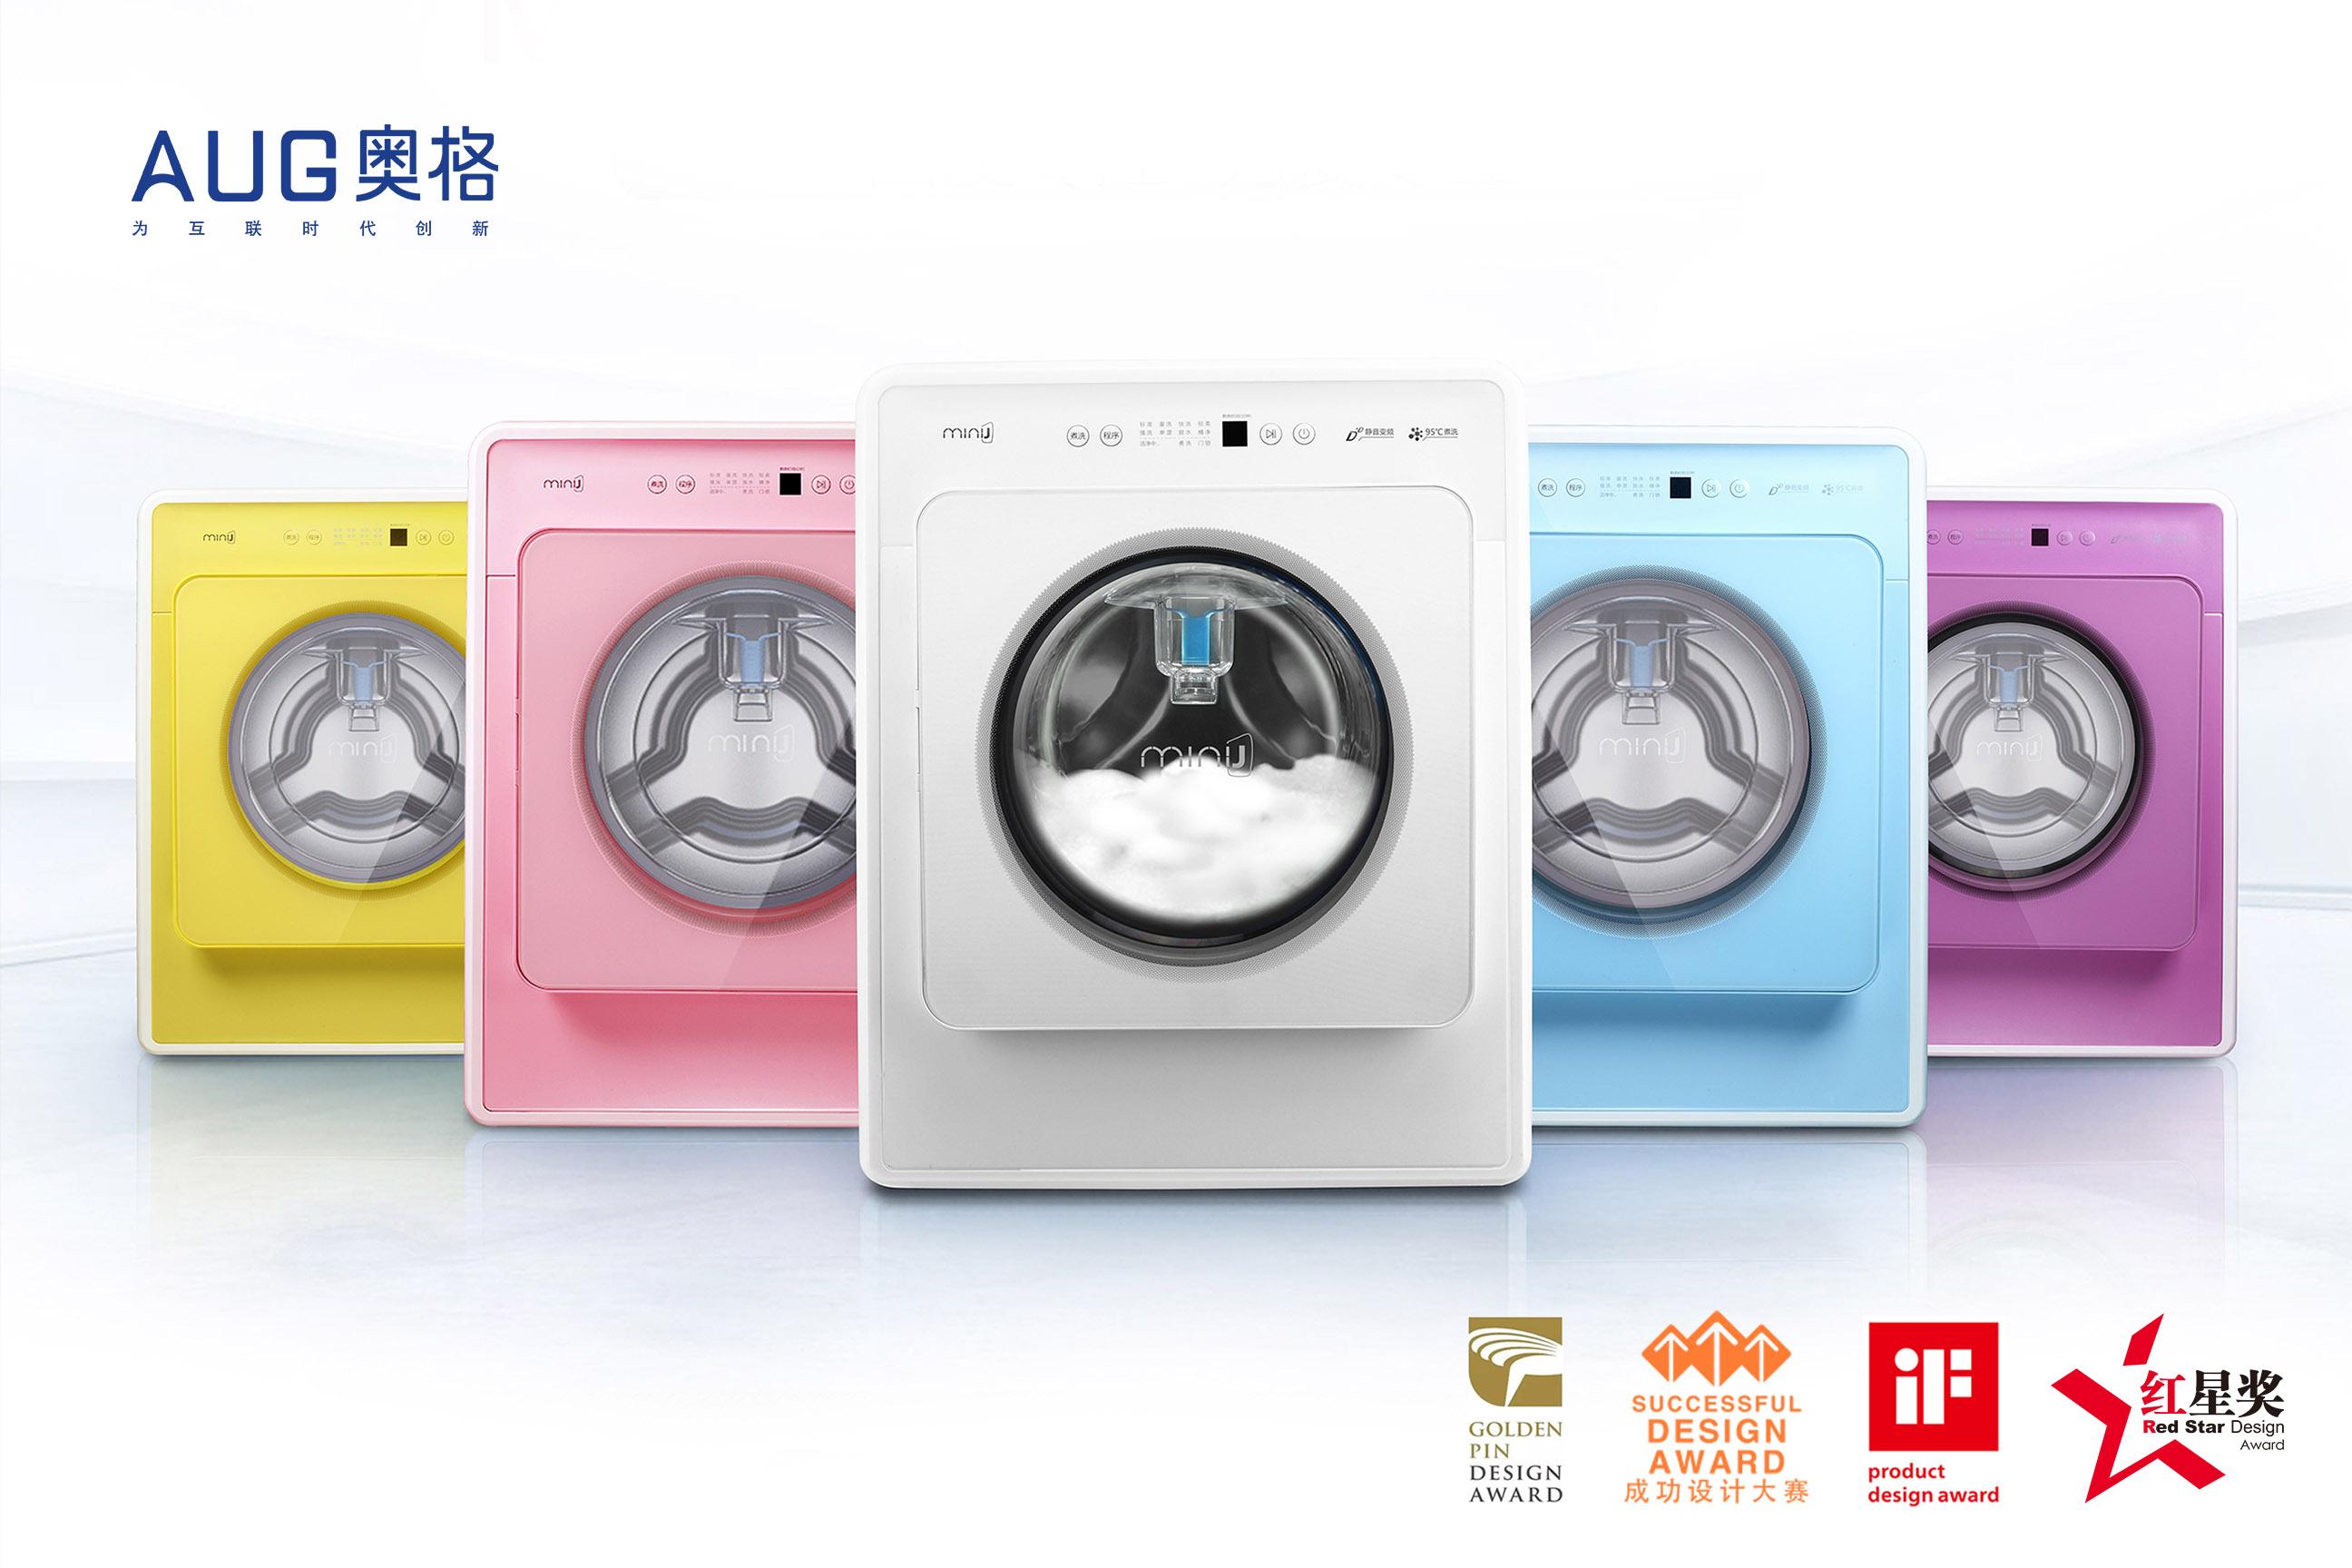 miniJ滚筒洗衣机外观设计